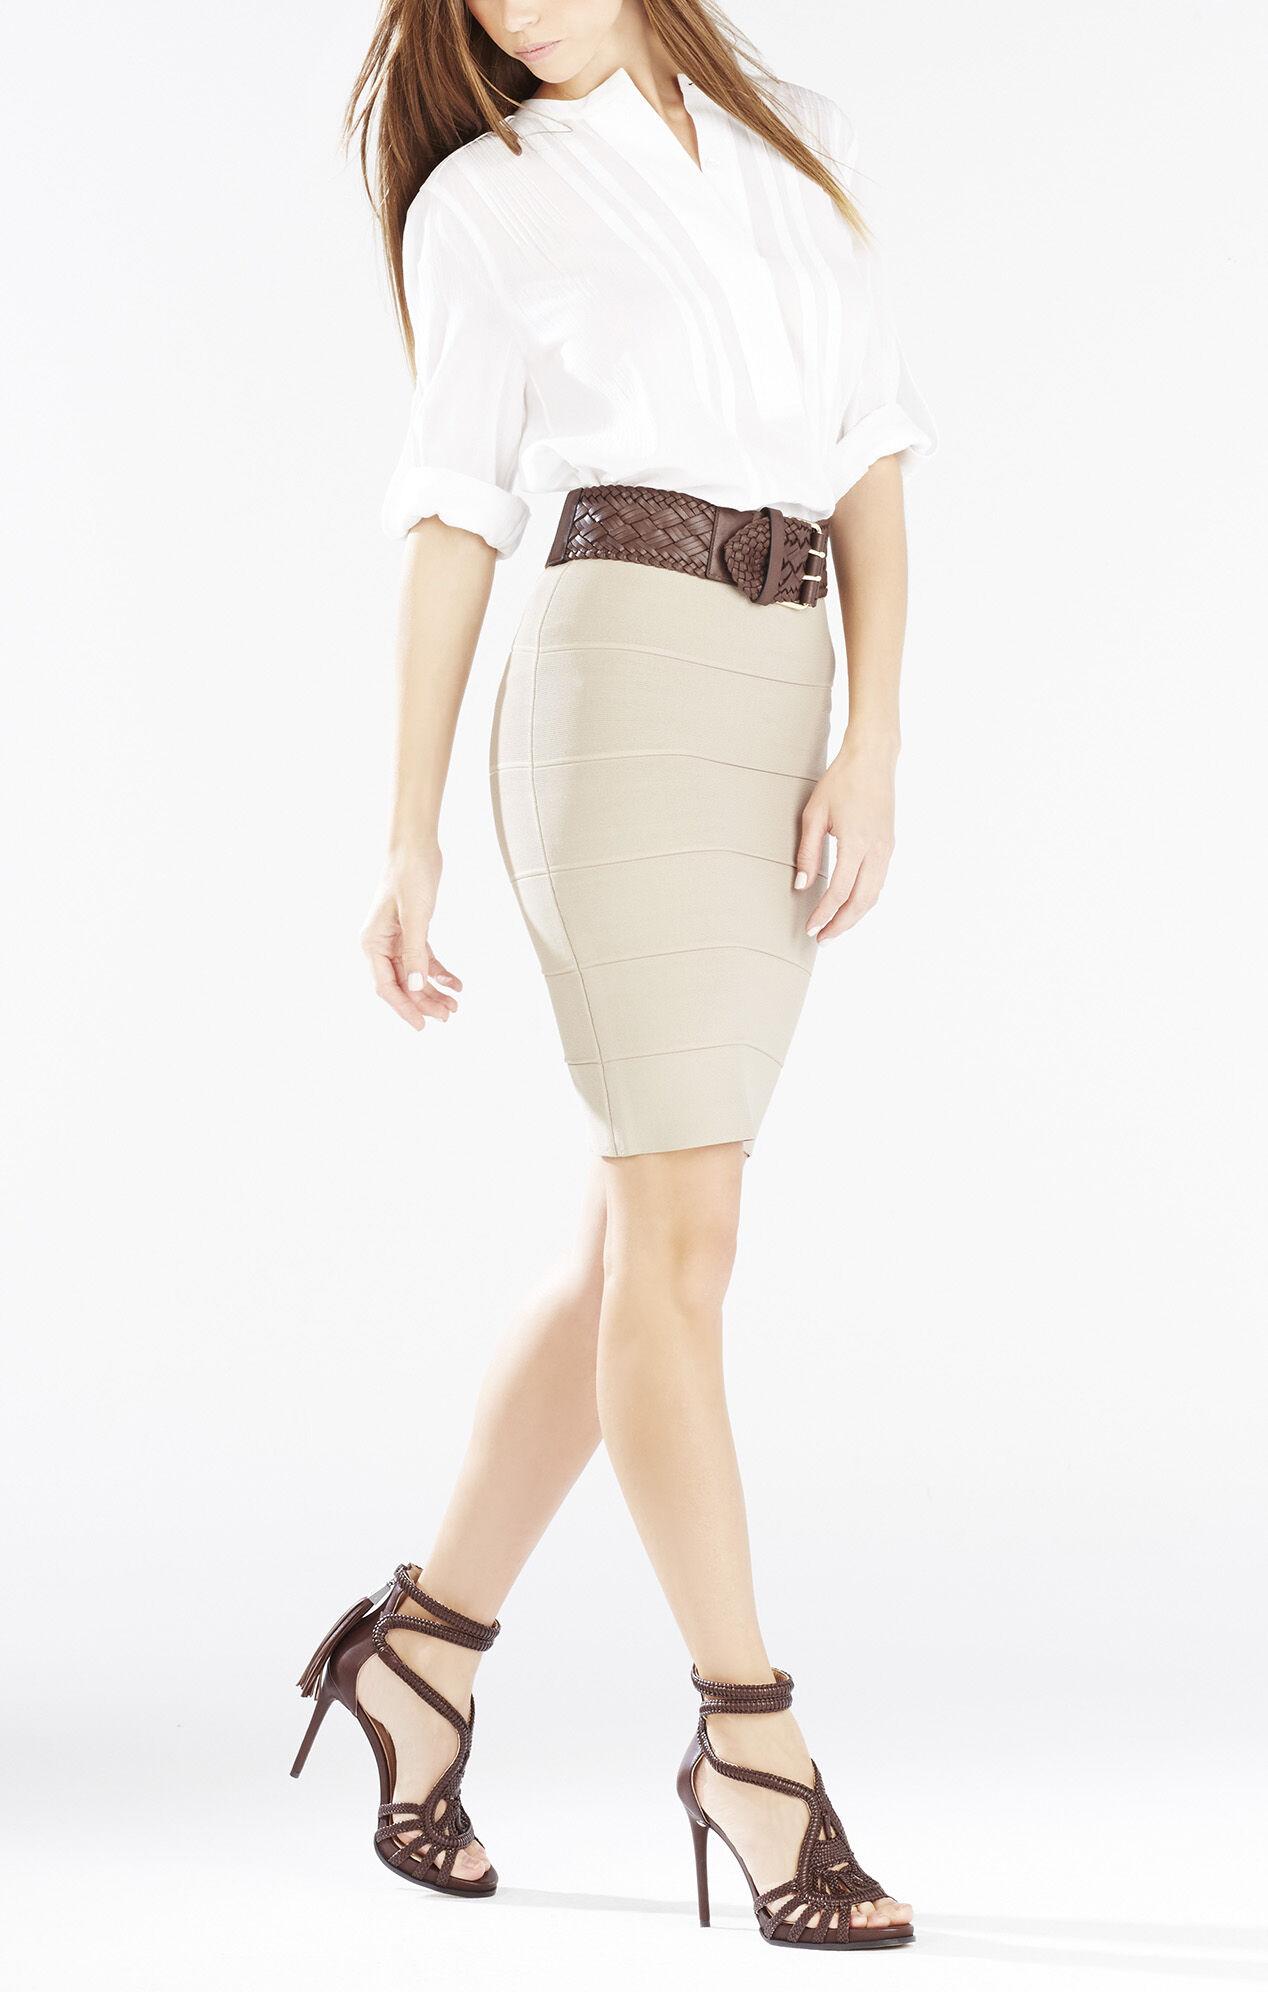 Esh High-Heel Leather Macrame Sandal